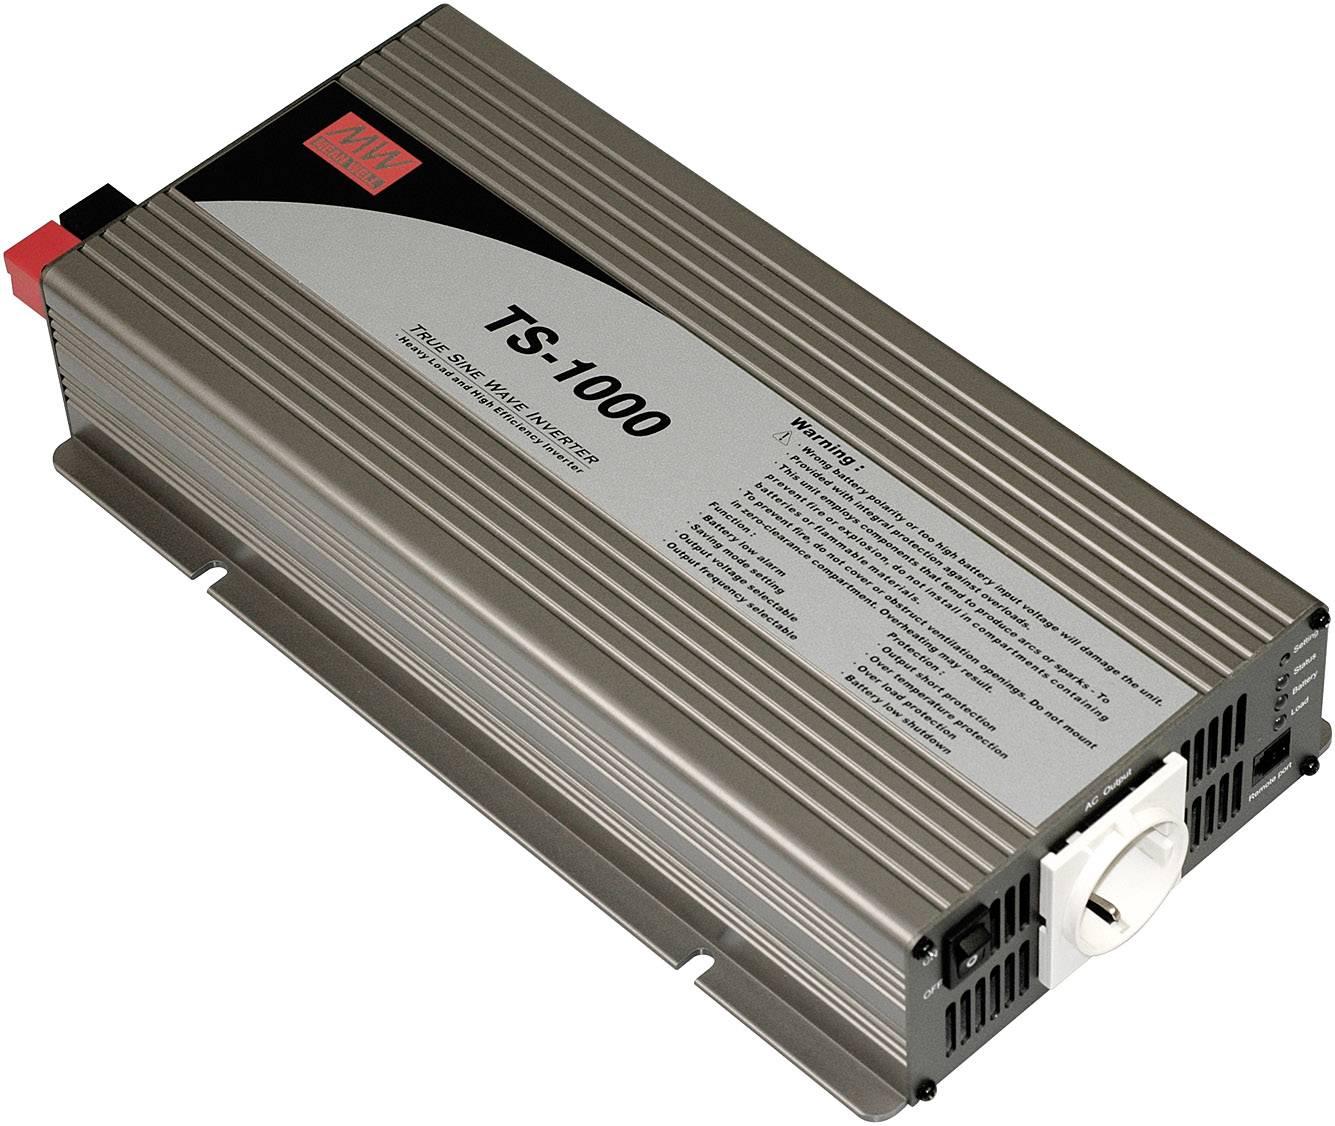 Měnič napětí Mean Well TS-1000-224B, 1000 W/1000 W